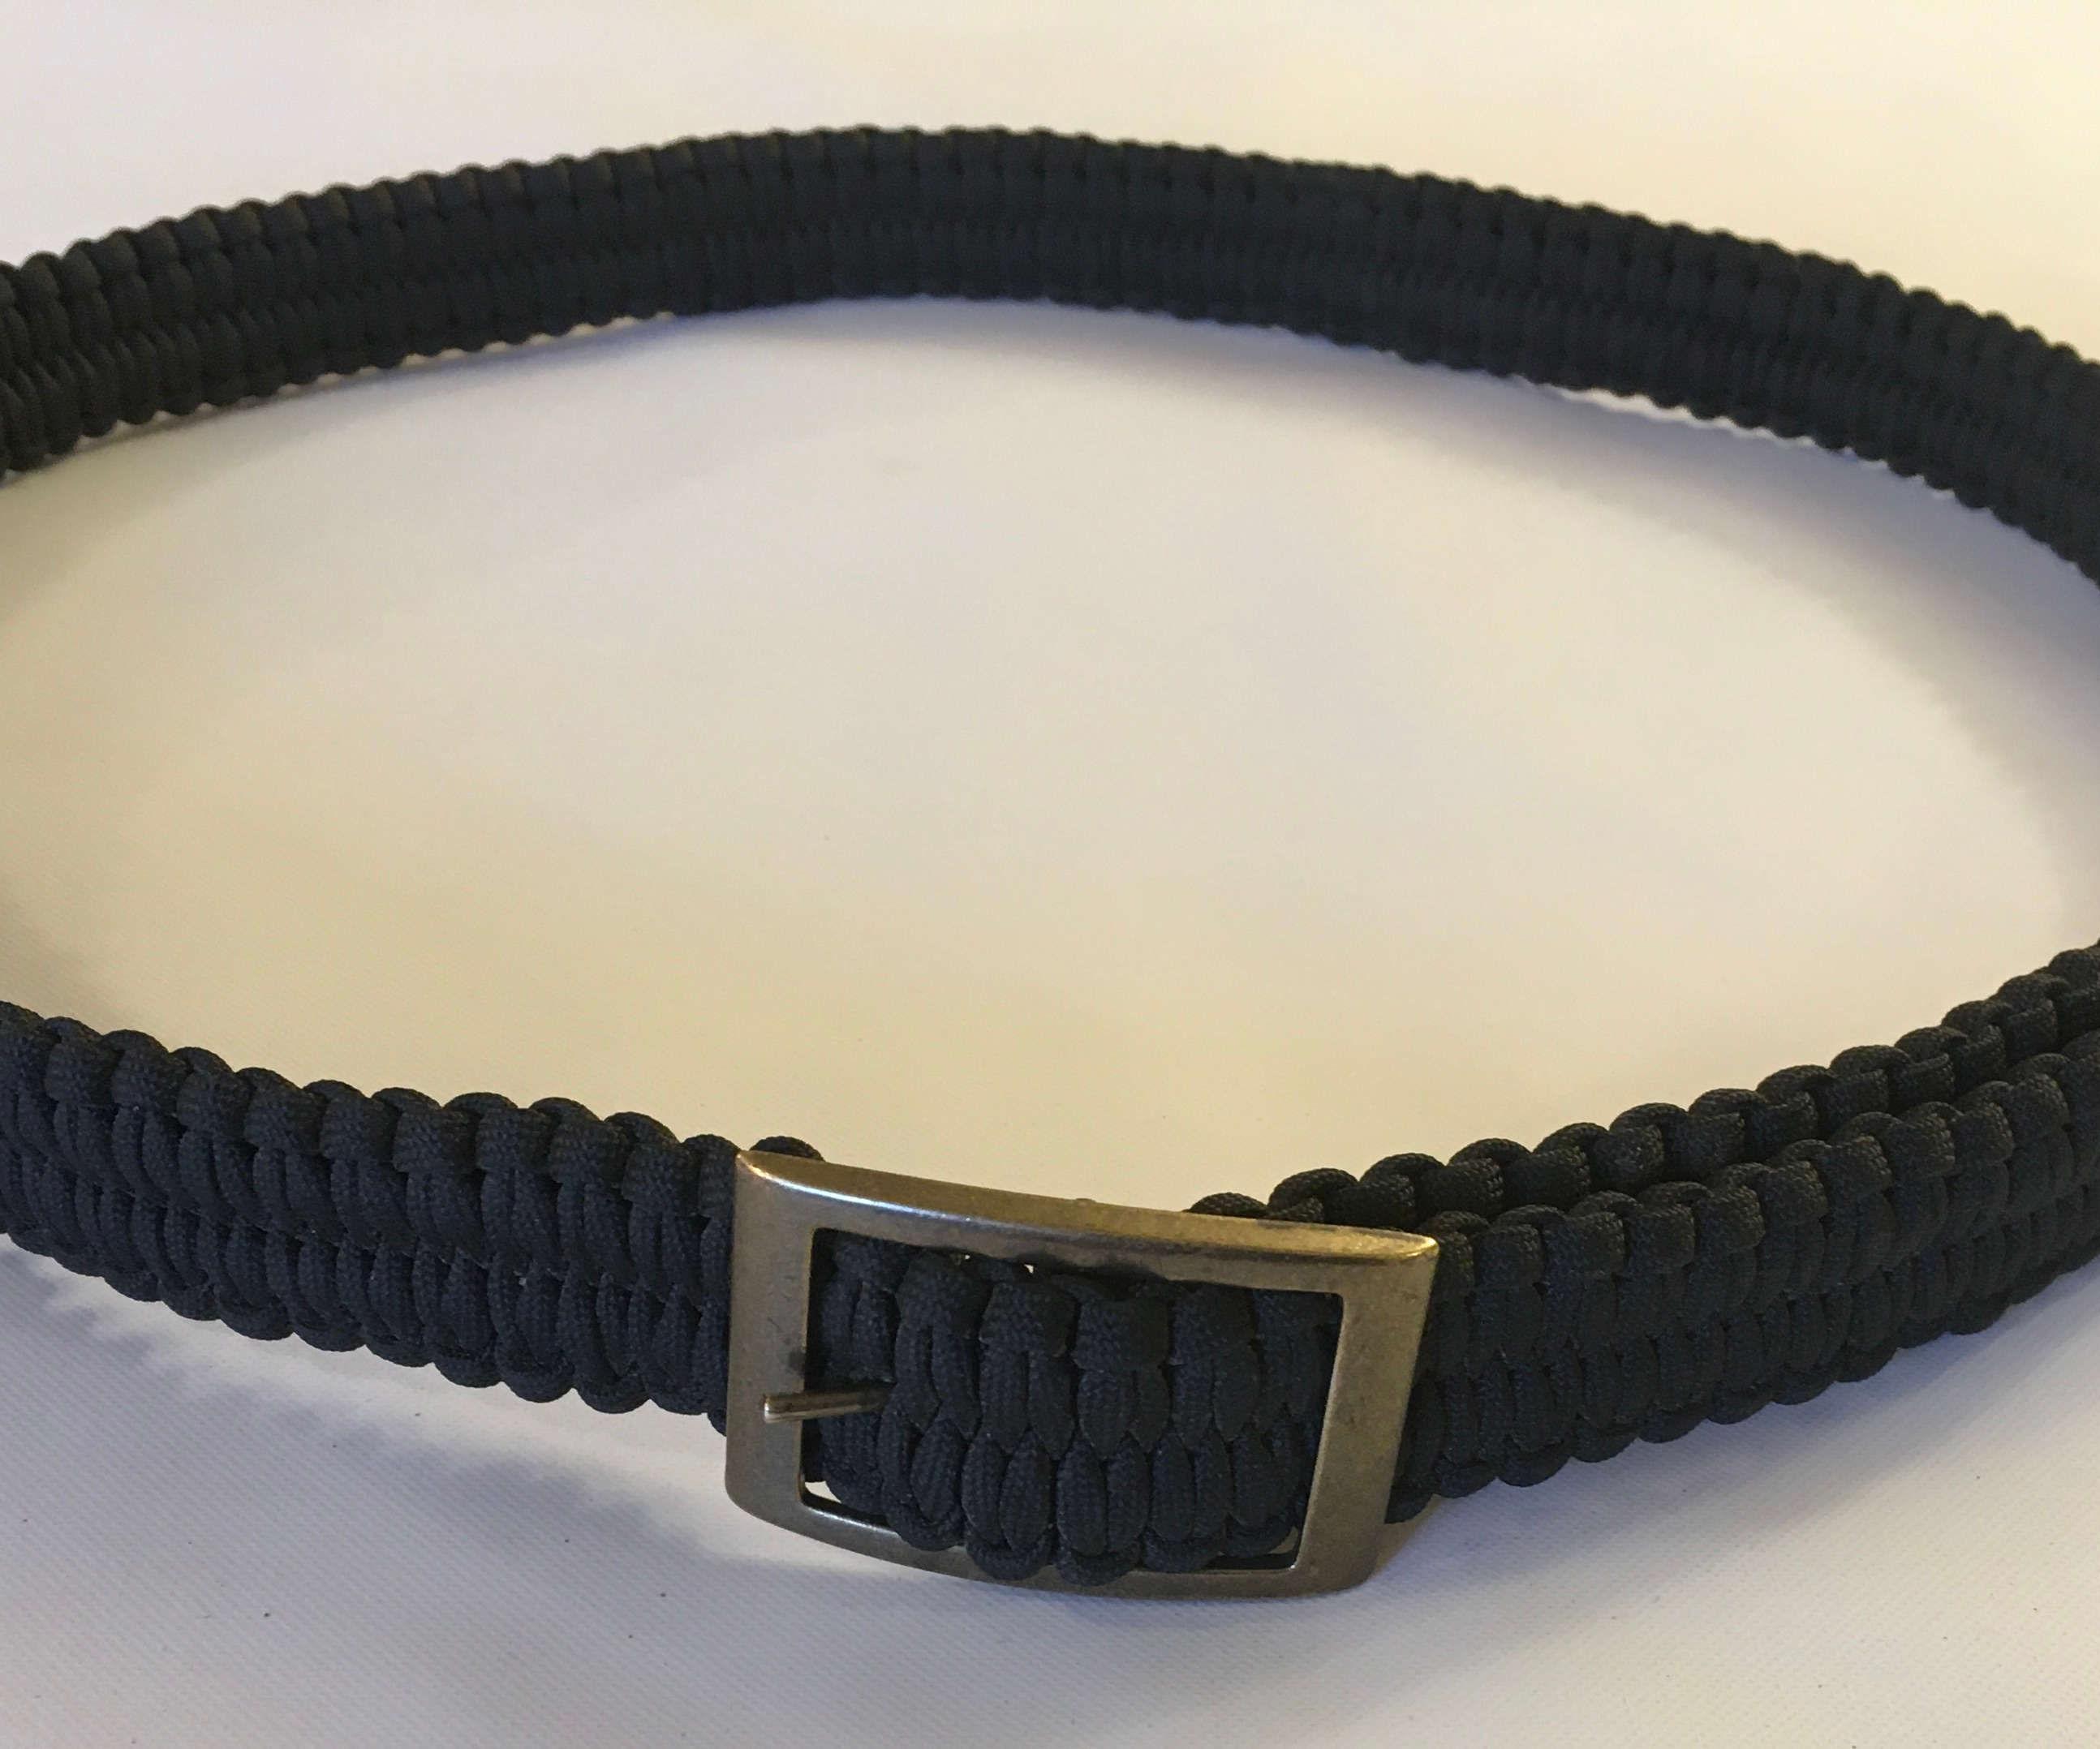 Bitterroot Braided Paracord Belt